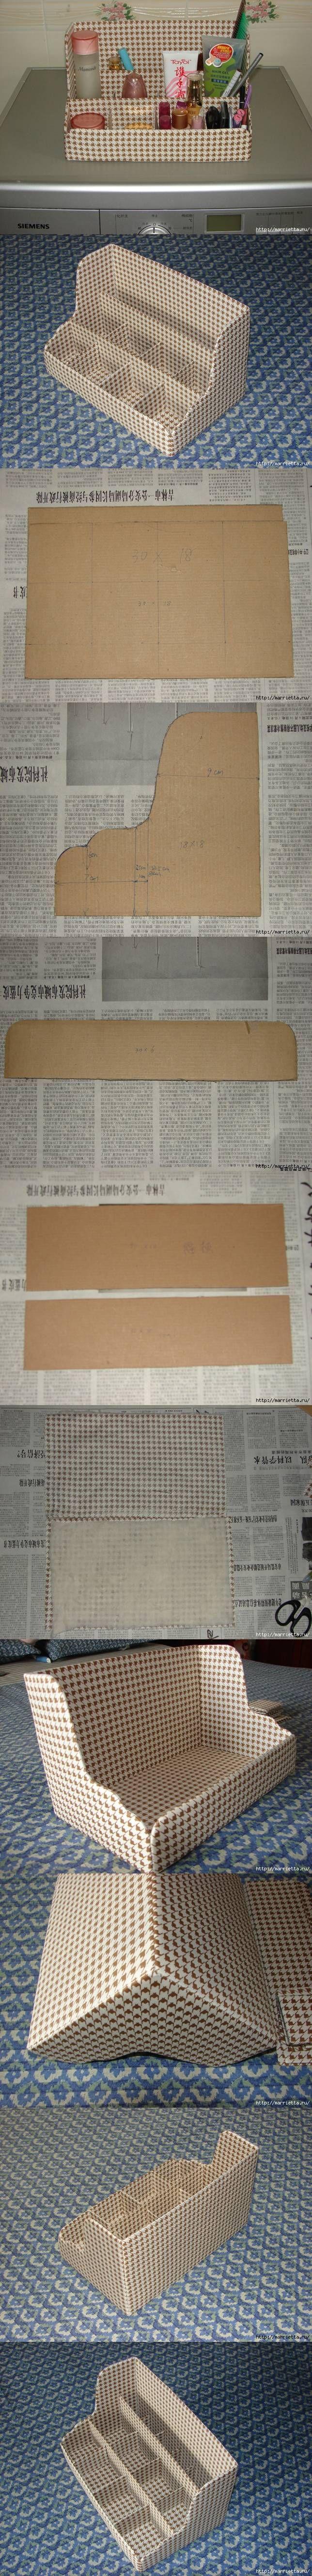 DIY Cardboard Shelves Organizer